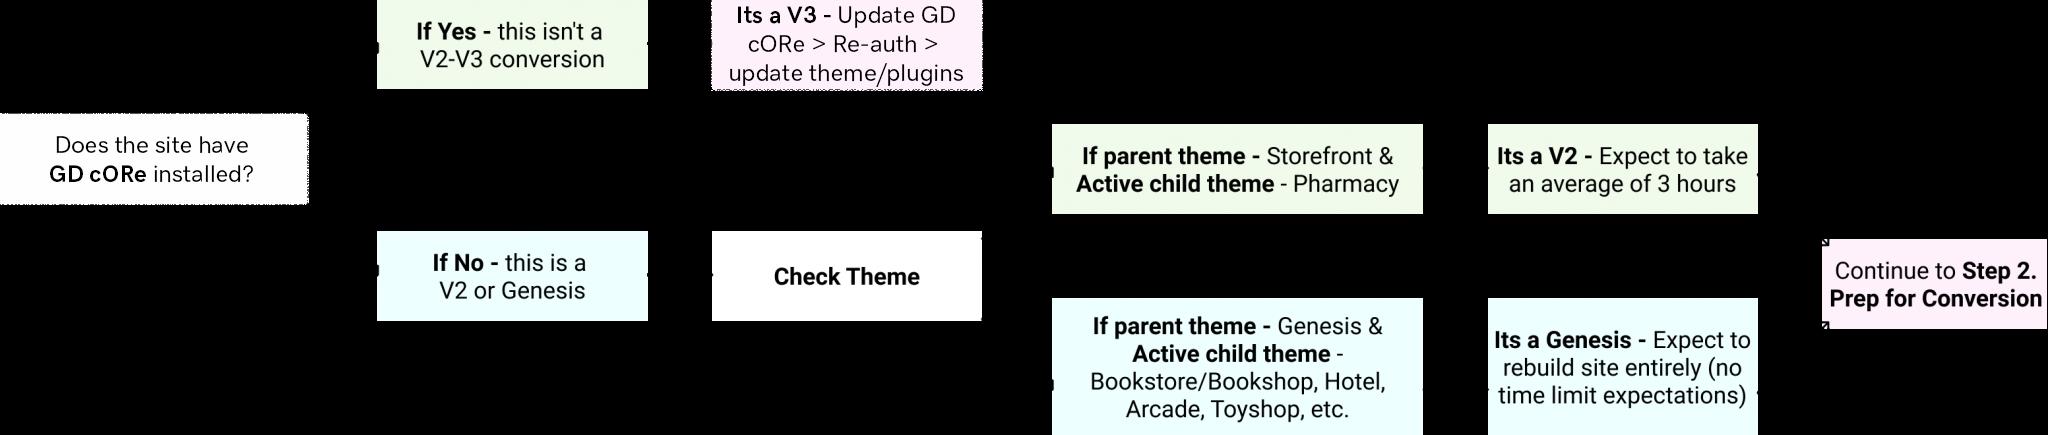 Determine-the-platform-2048x435_GDcORe